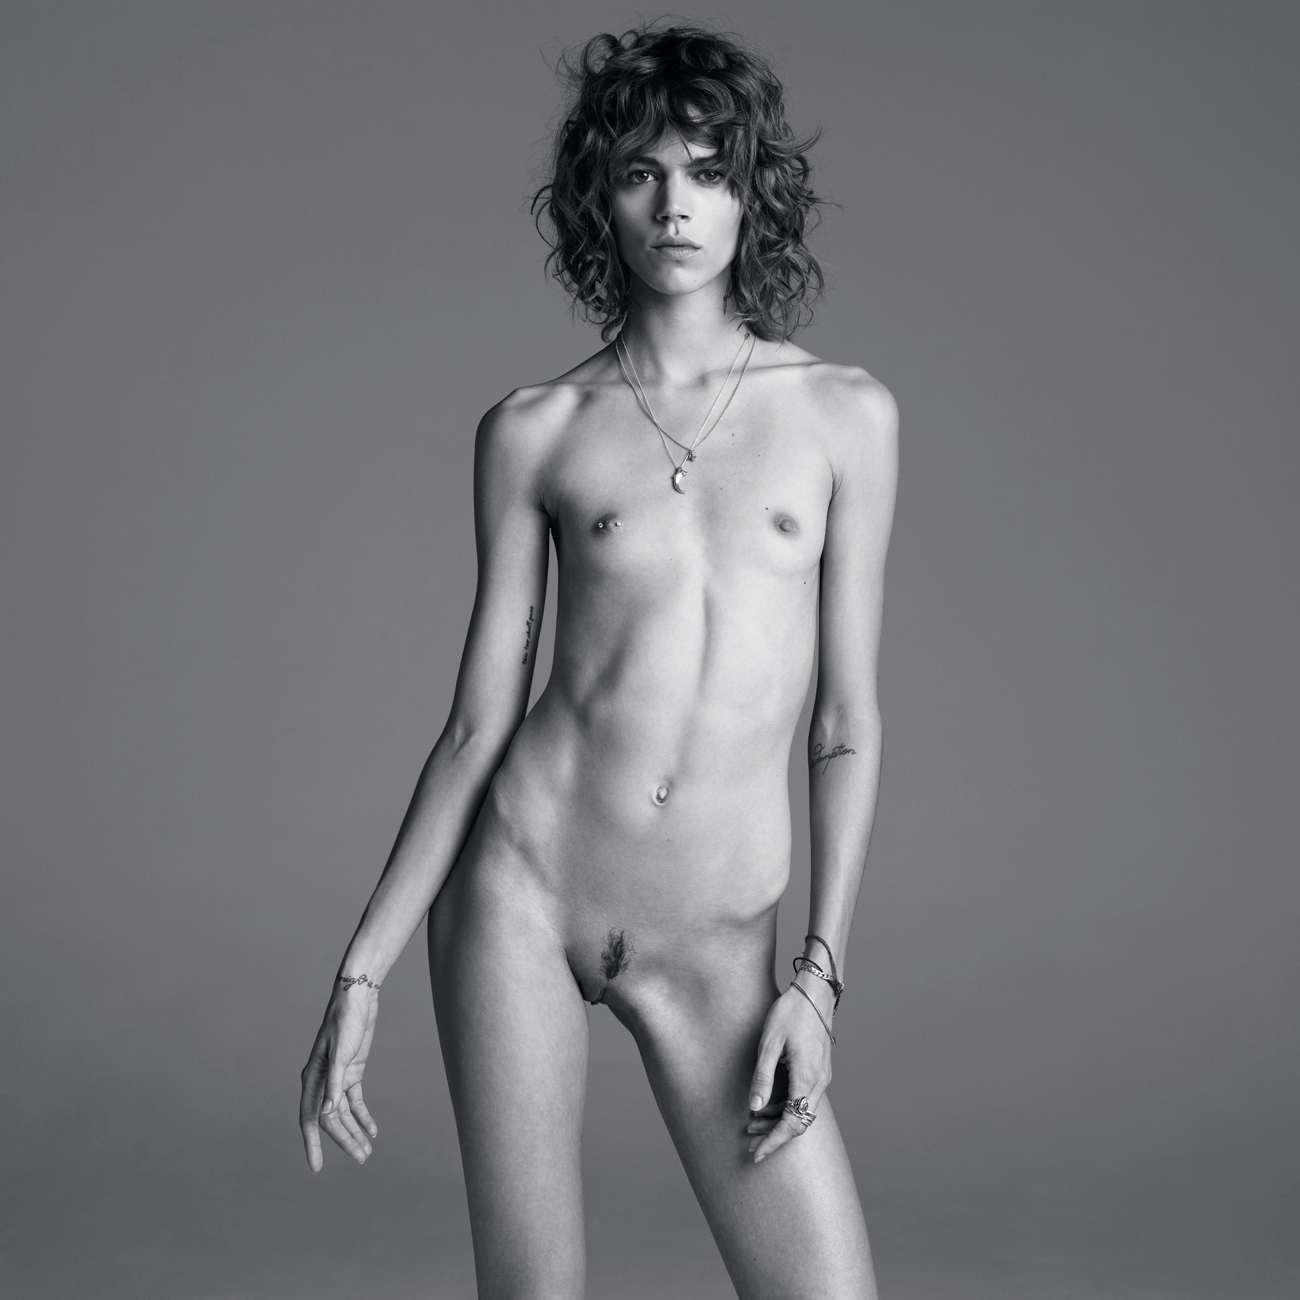 Freja beha erichsen naked